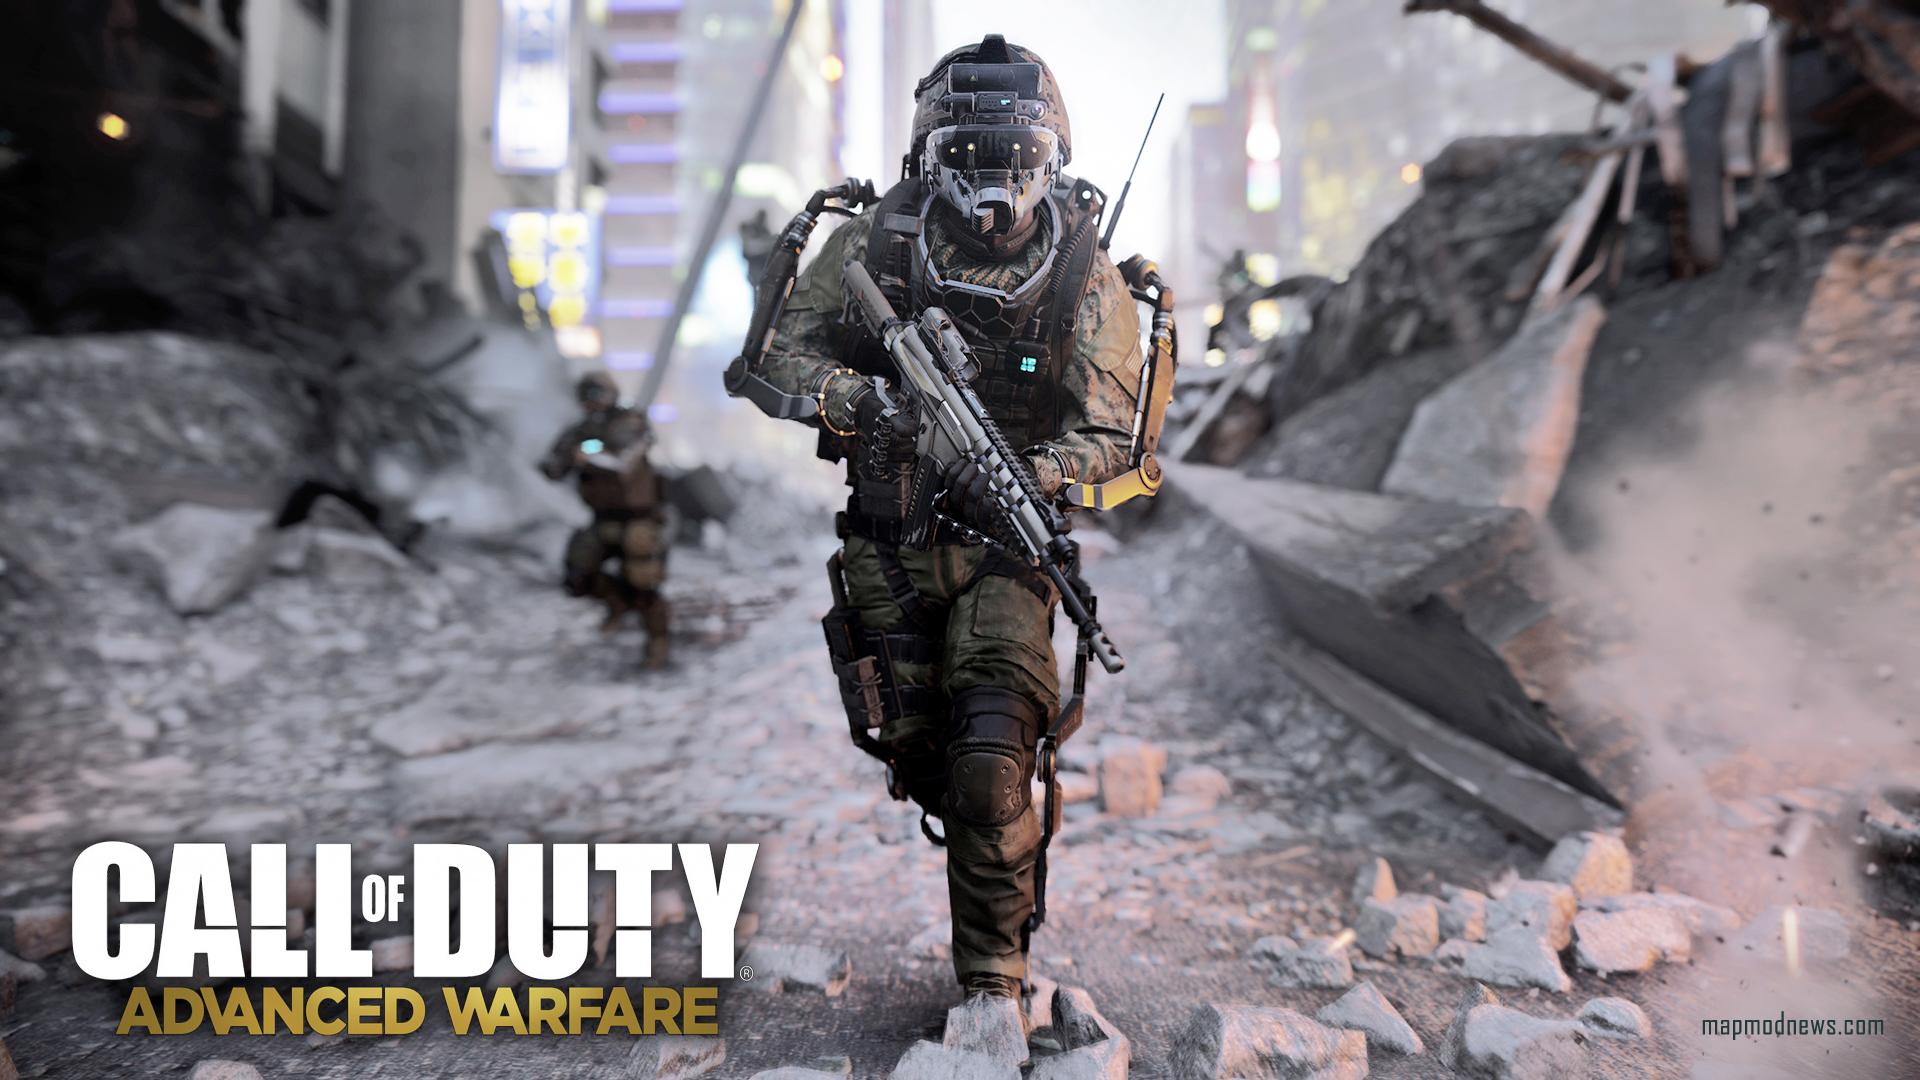 Call of Duty Advanced Warfare Wallpaper WallpaperSafari